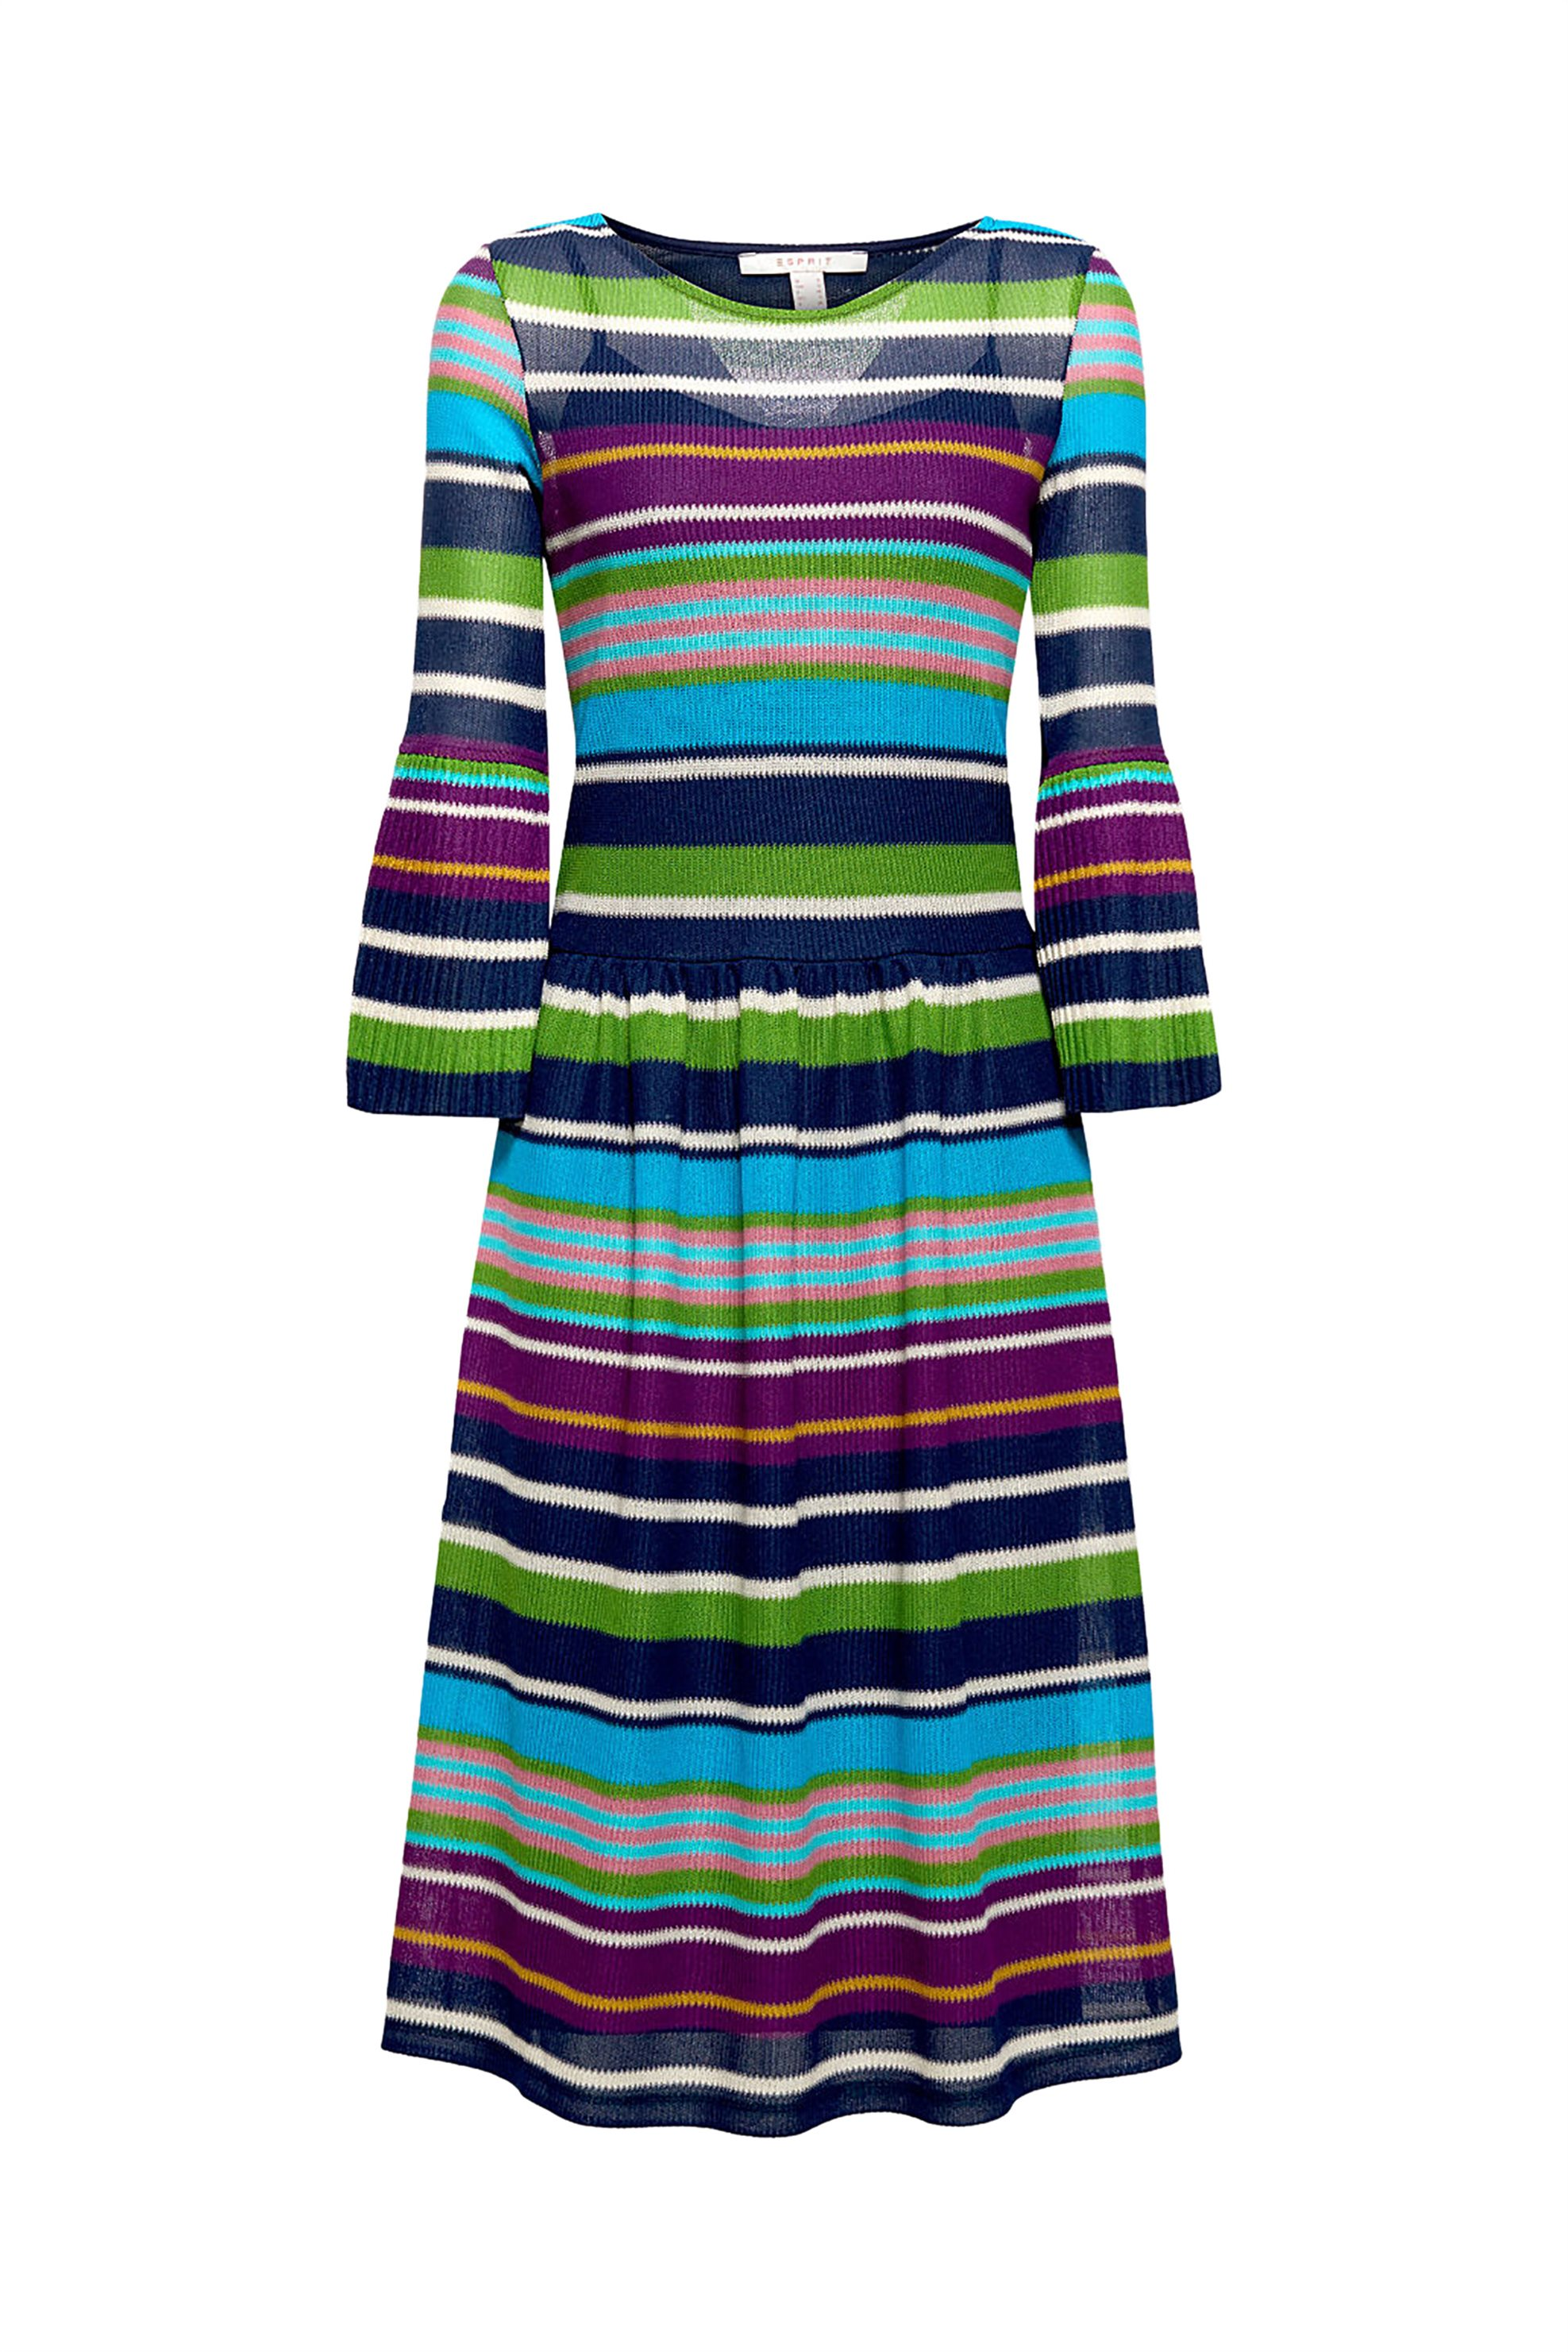 e4e846d455df Esprit - Γυναικεία Φορέματα - Σελίδα 1